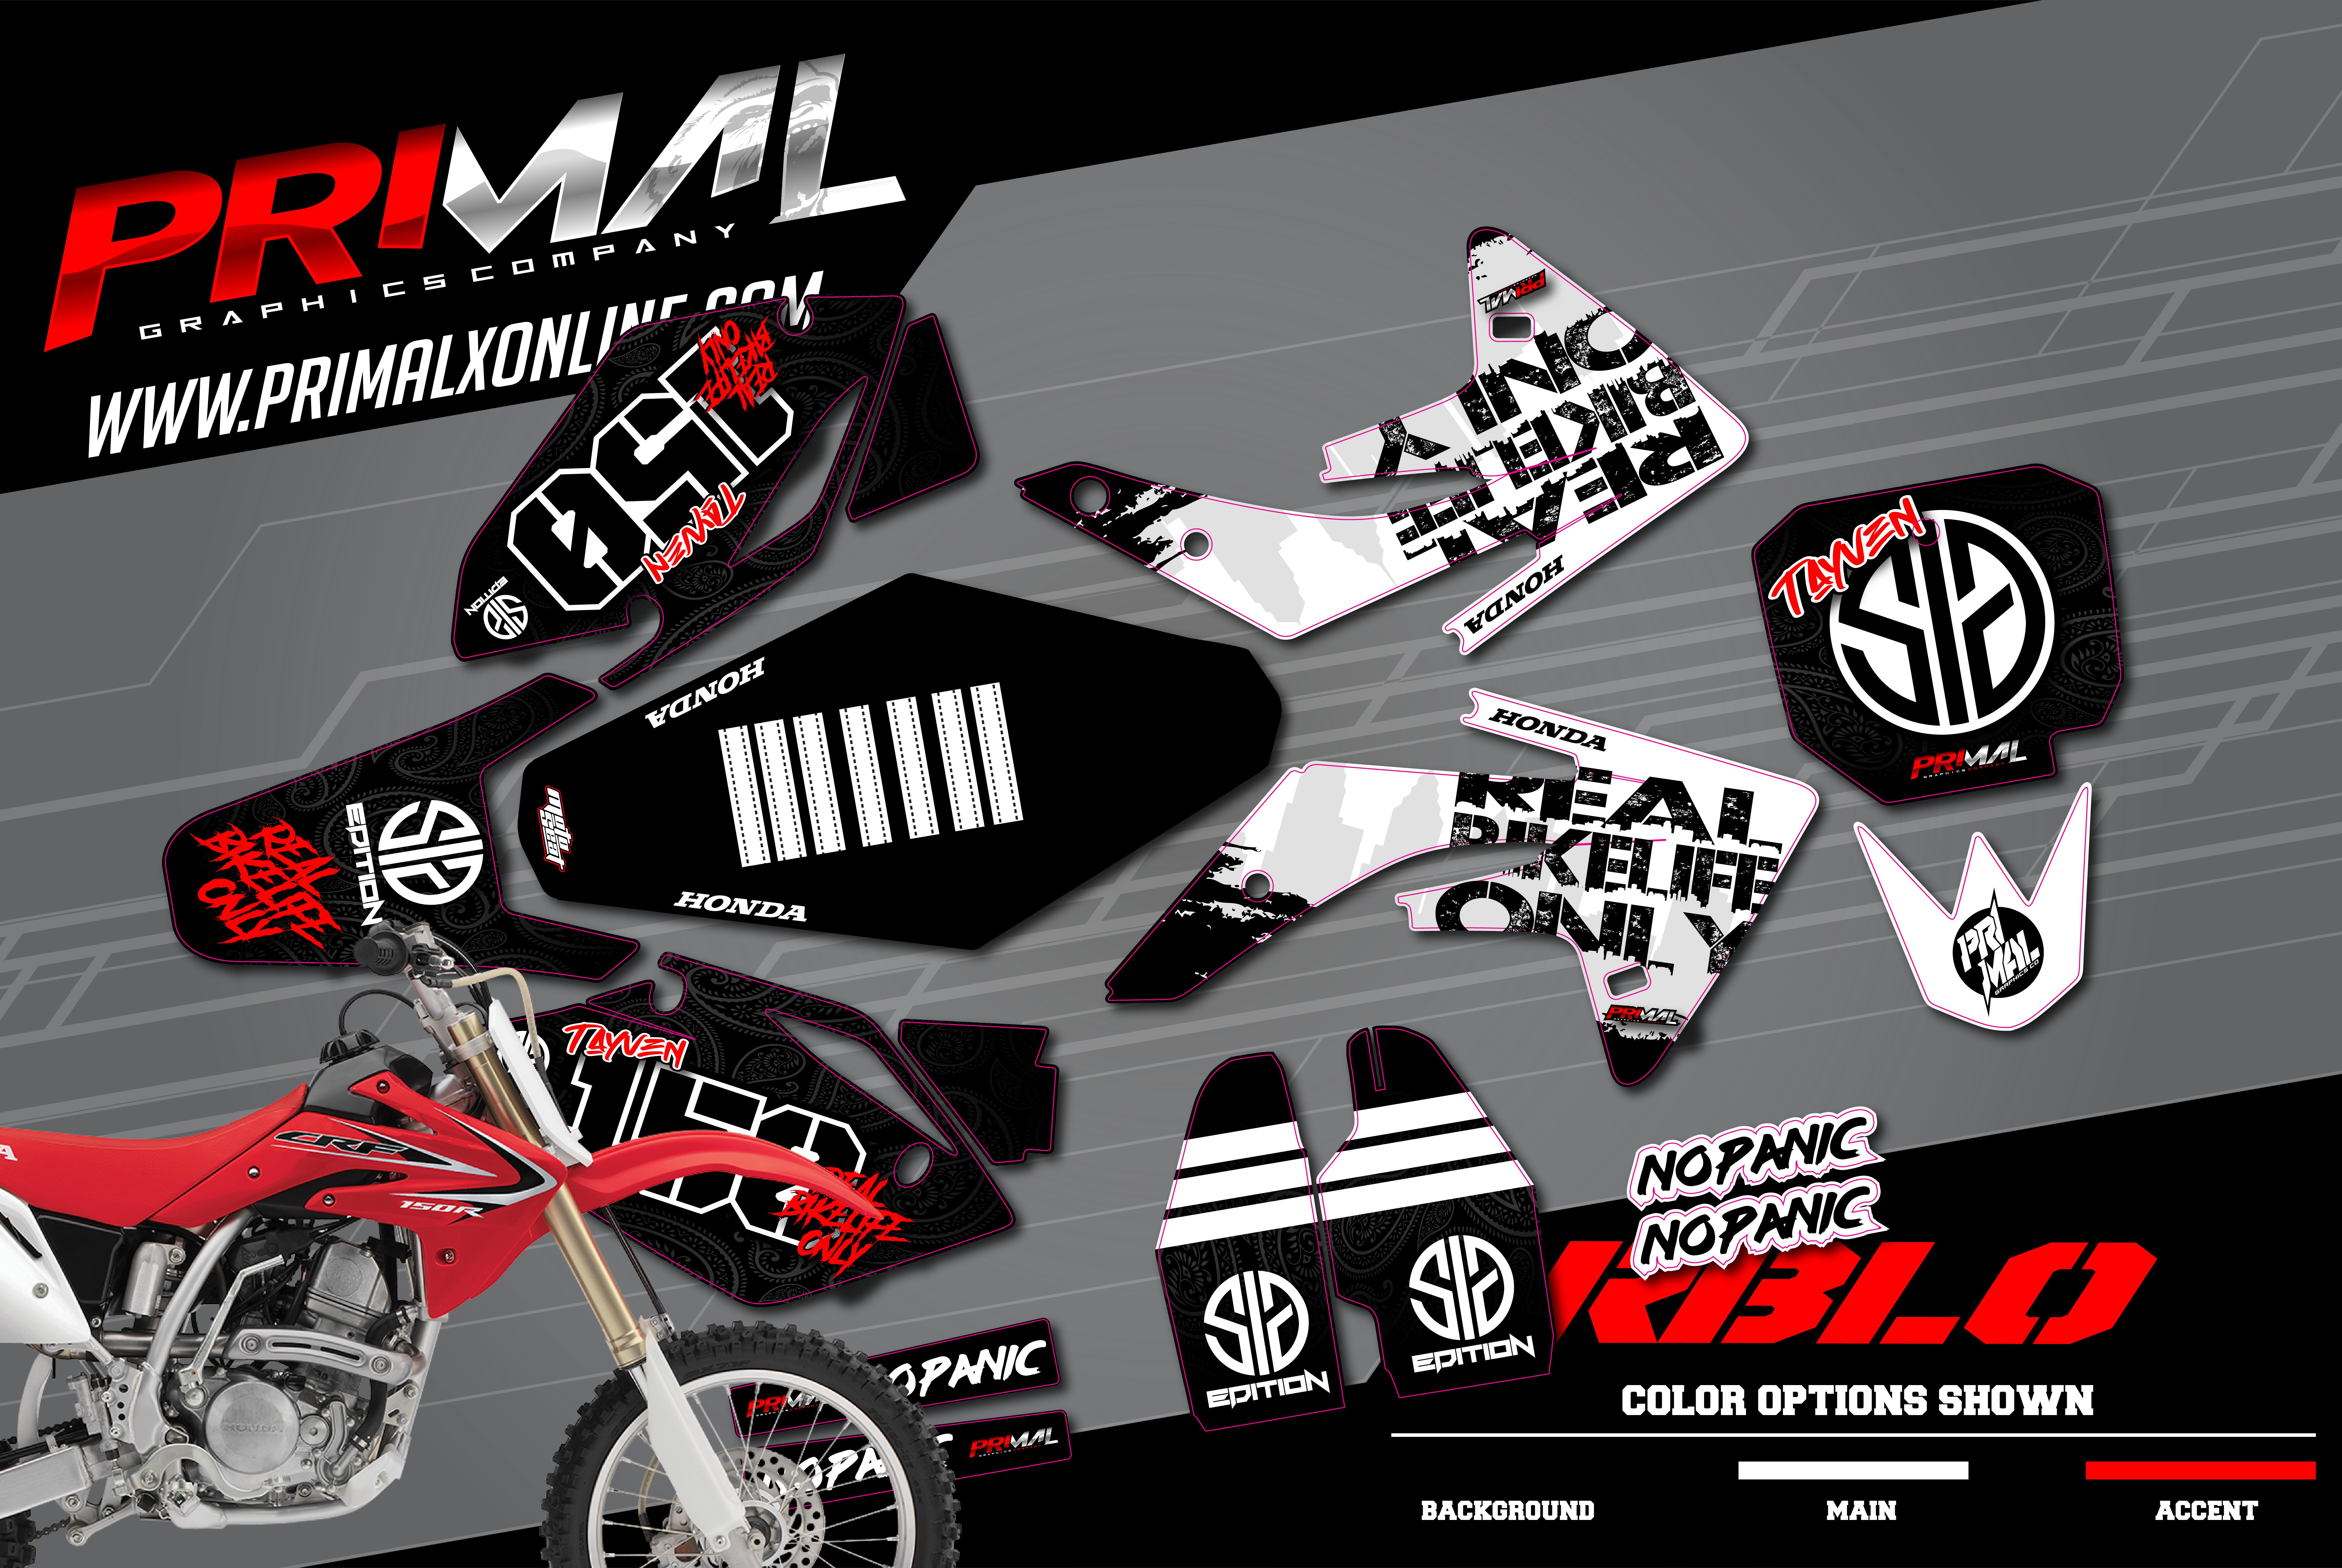 PRIMAL-X-MOTORSPORTS-PRIMAL-GRAPHICS-CO-2021-HONDA-CRF150R-CRF-MOTOCROSS-GRAPHICS-BIKELIFE-CHARM-CITY-KINGS-01